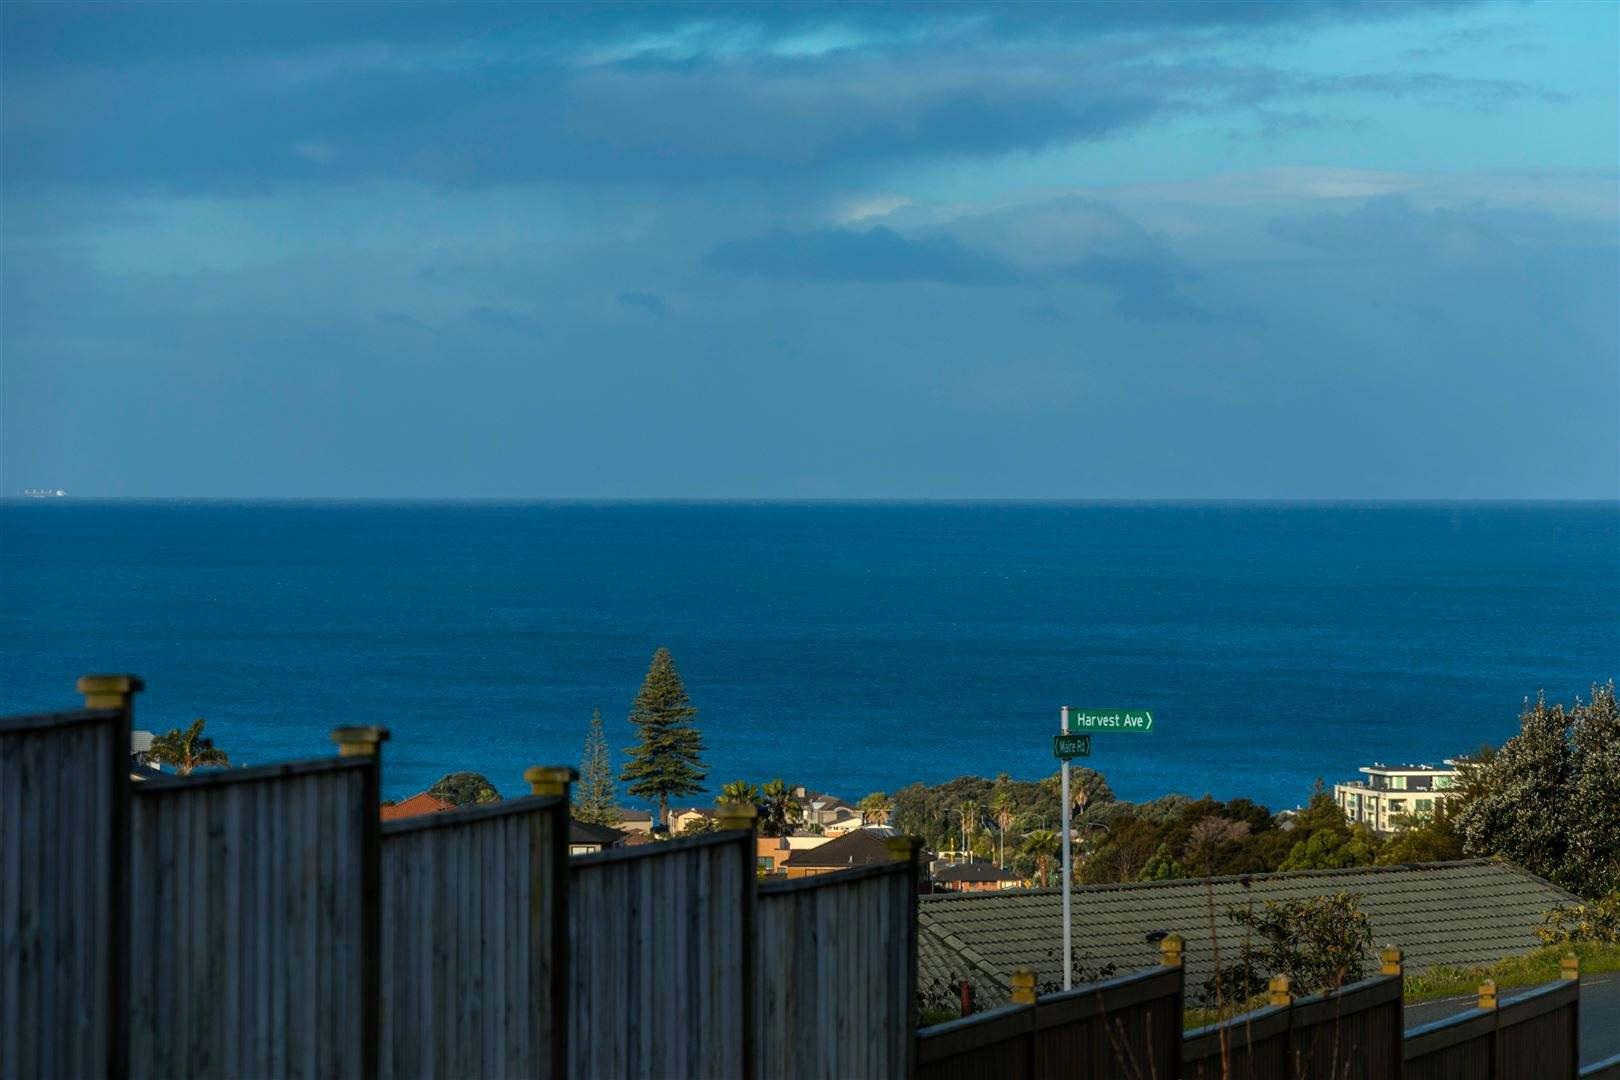 Orewa 5房 全新海景别墅 风格吸睛 步行至学校 海滩近在咫尺 车位充足 绝对不会让您失望! Big, Brand New & Sea Views